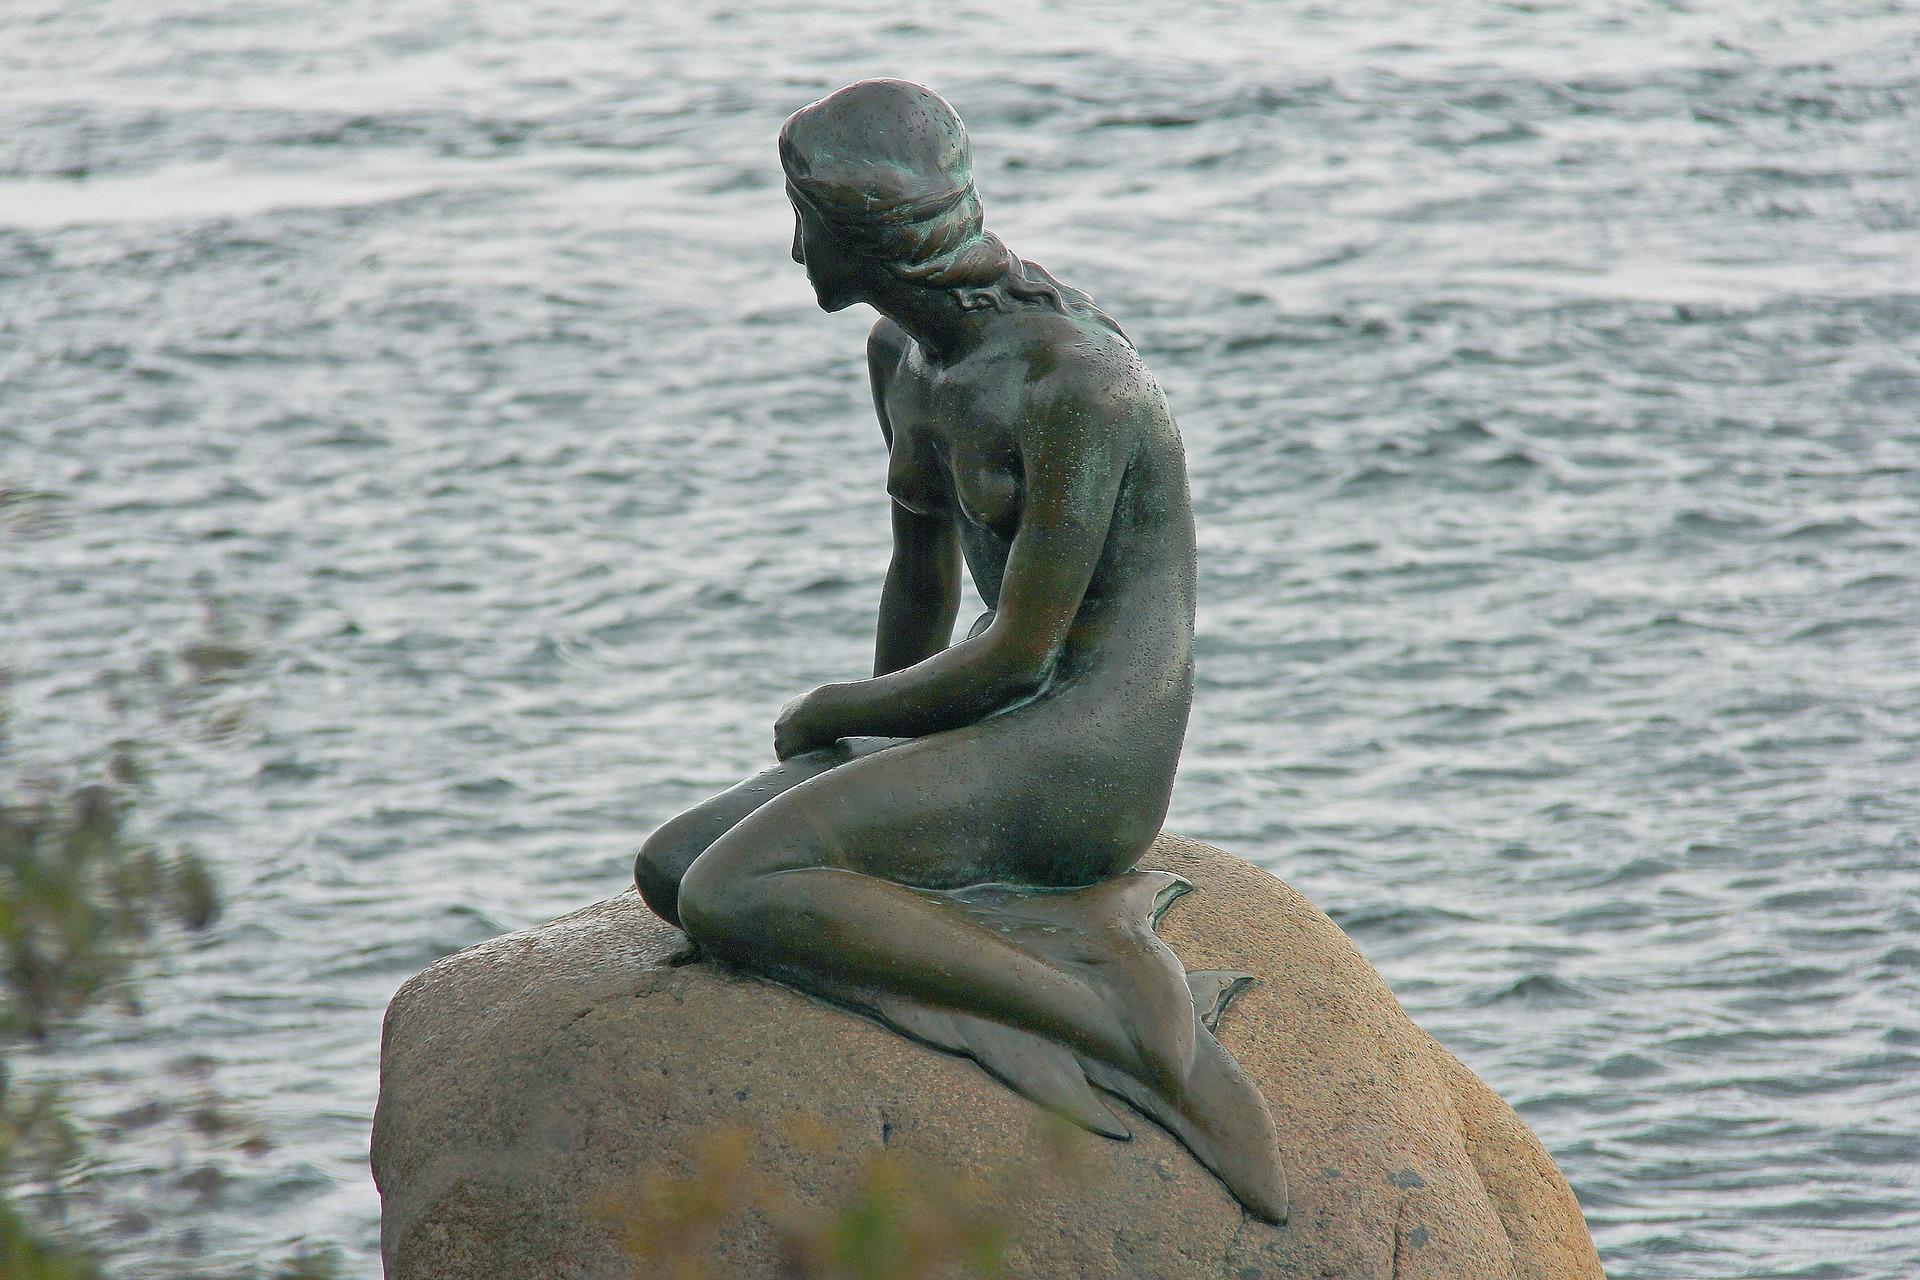 Paesi più sicuri al mondo statua sirenetta Danimarca